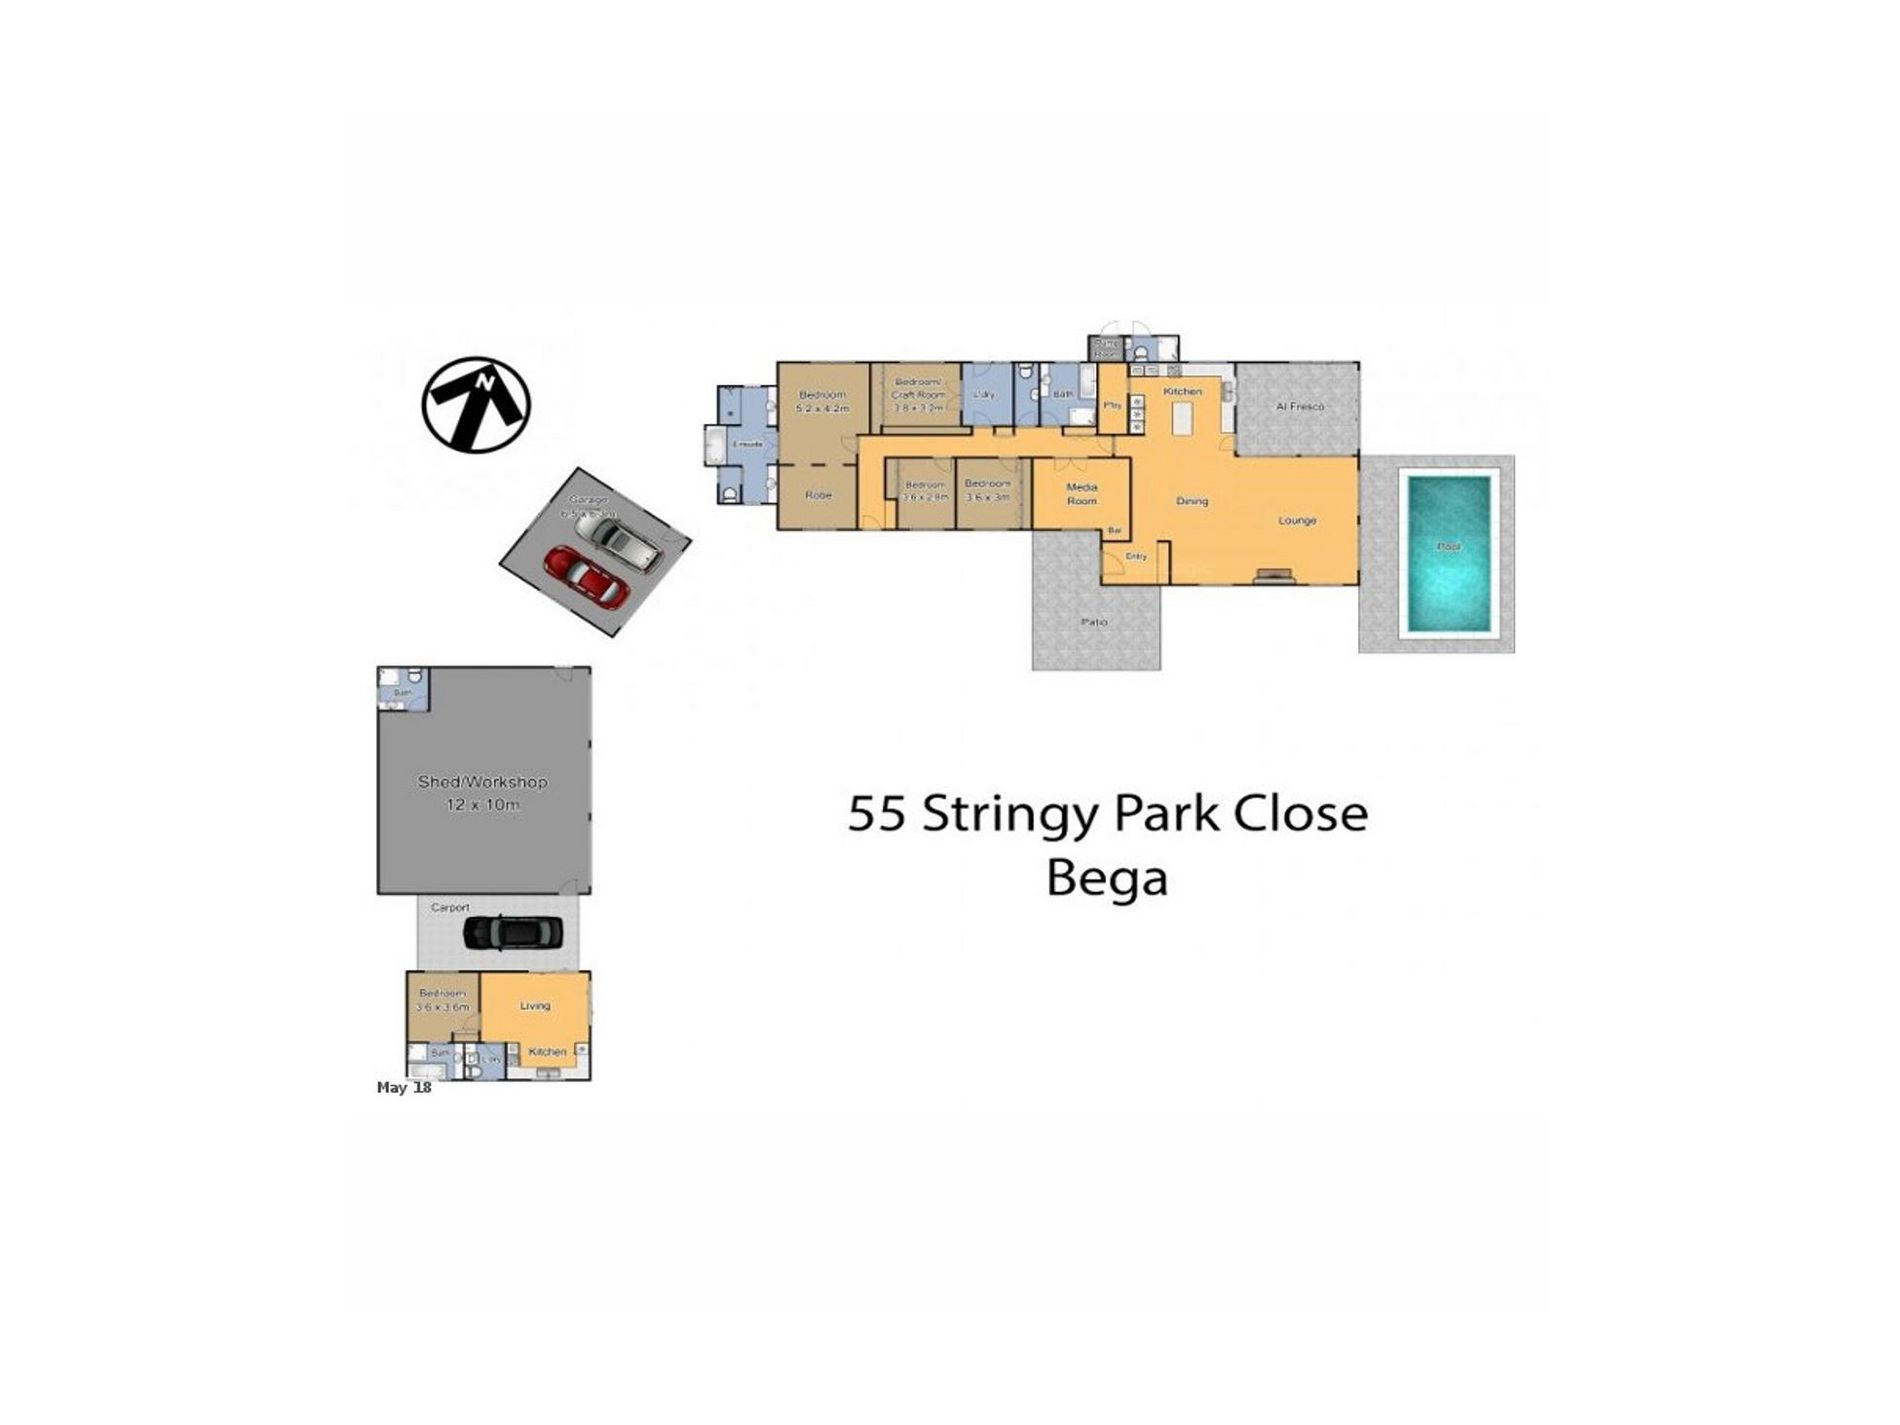 55 Stringy Park Close, Bega